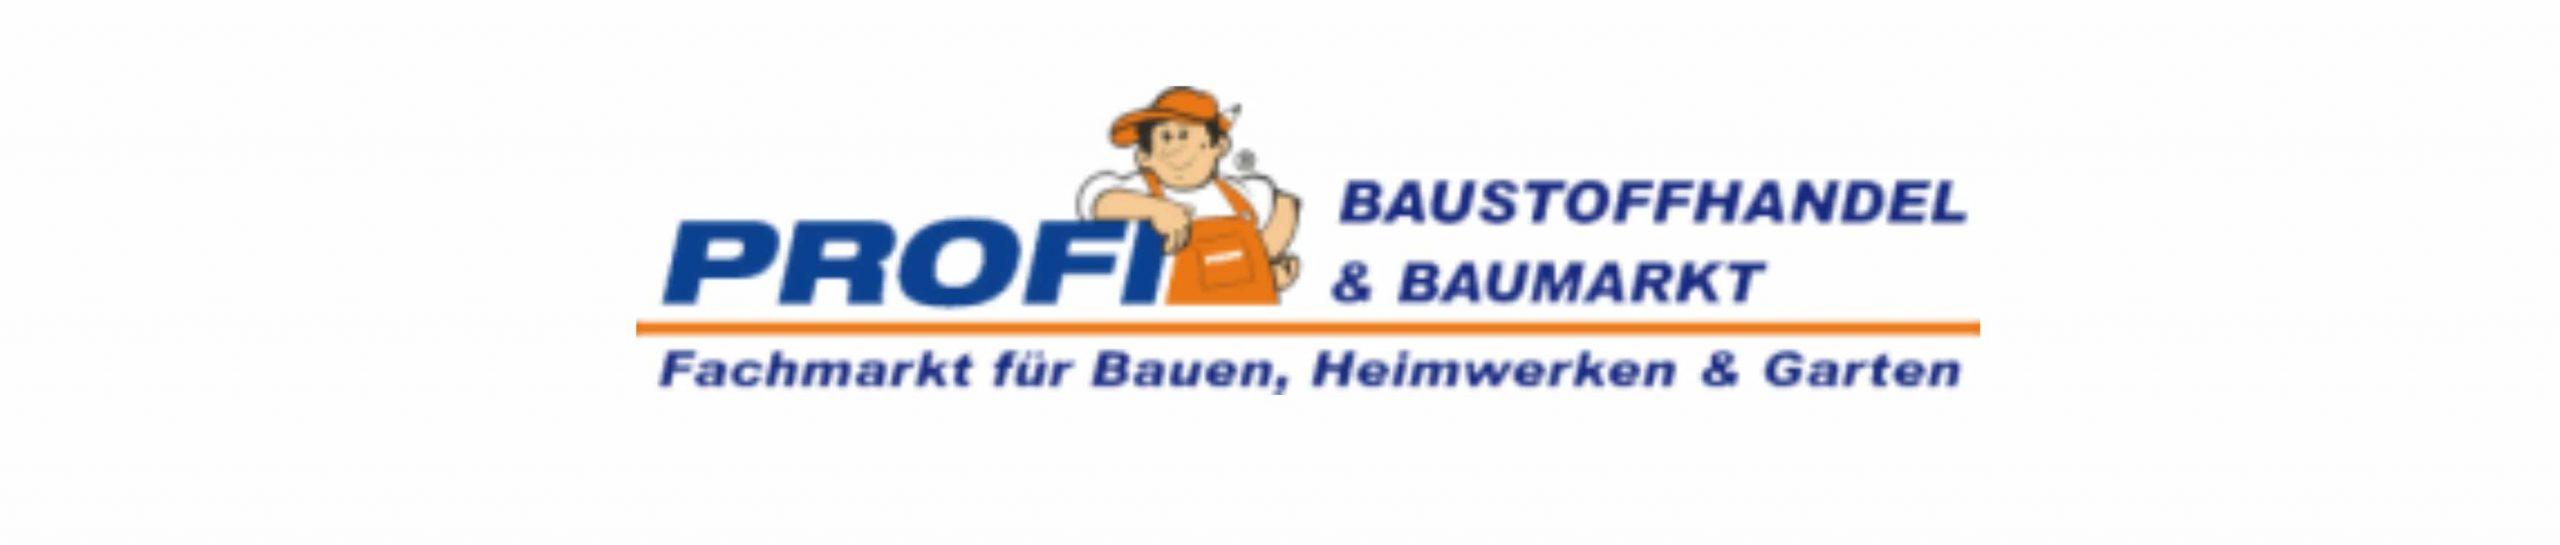 PROFI Berger Baustoffhandel & Baumarkt - Dolsenhain